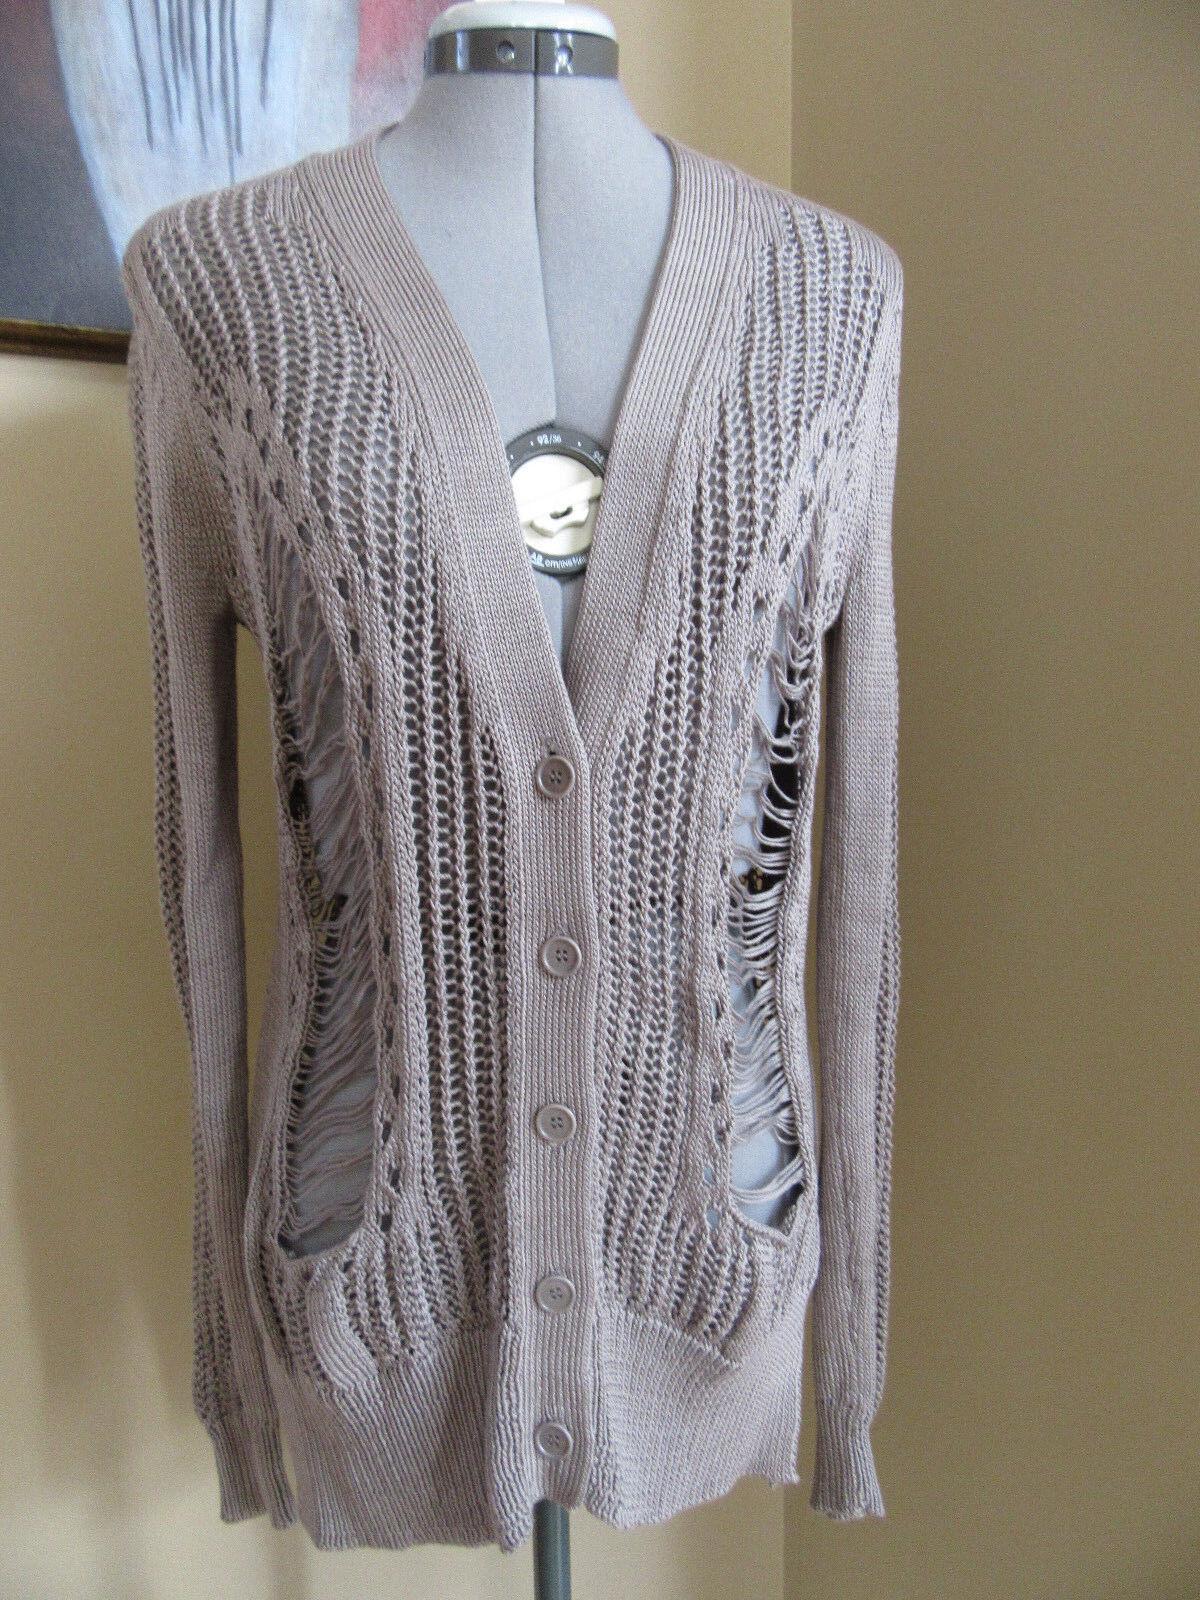 NWT BCBG KIRIL Moss color Cotton Cardigan Sweater Size XS